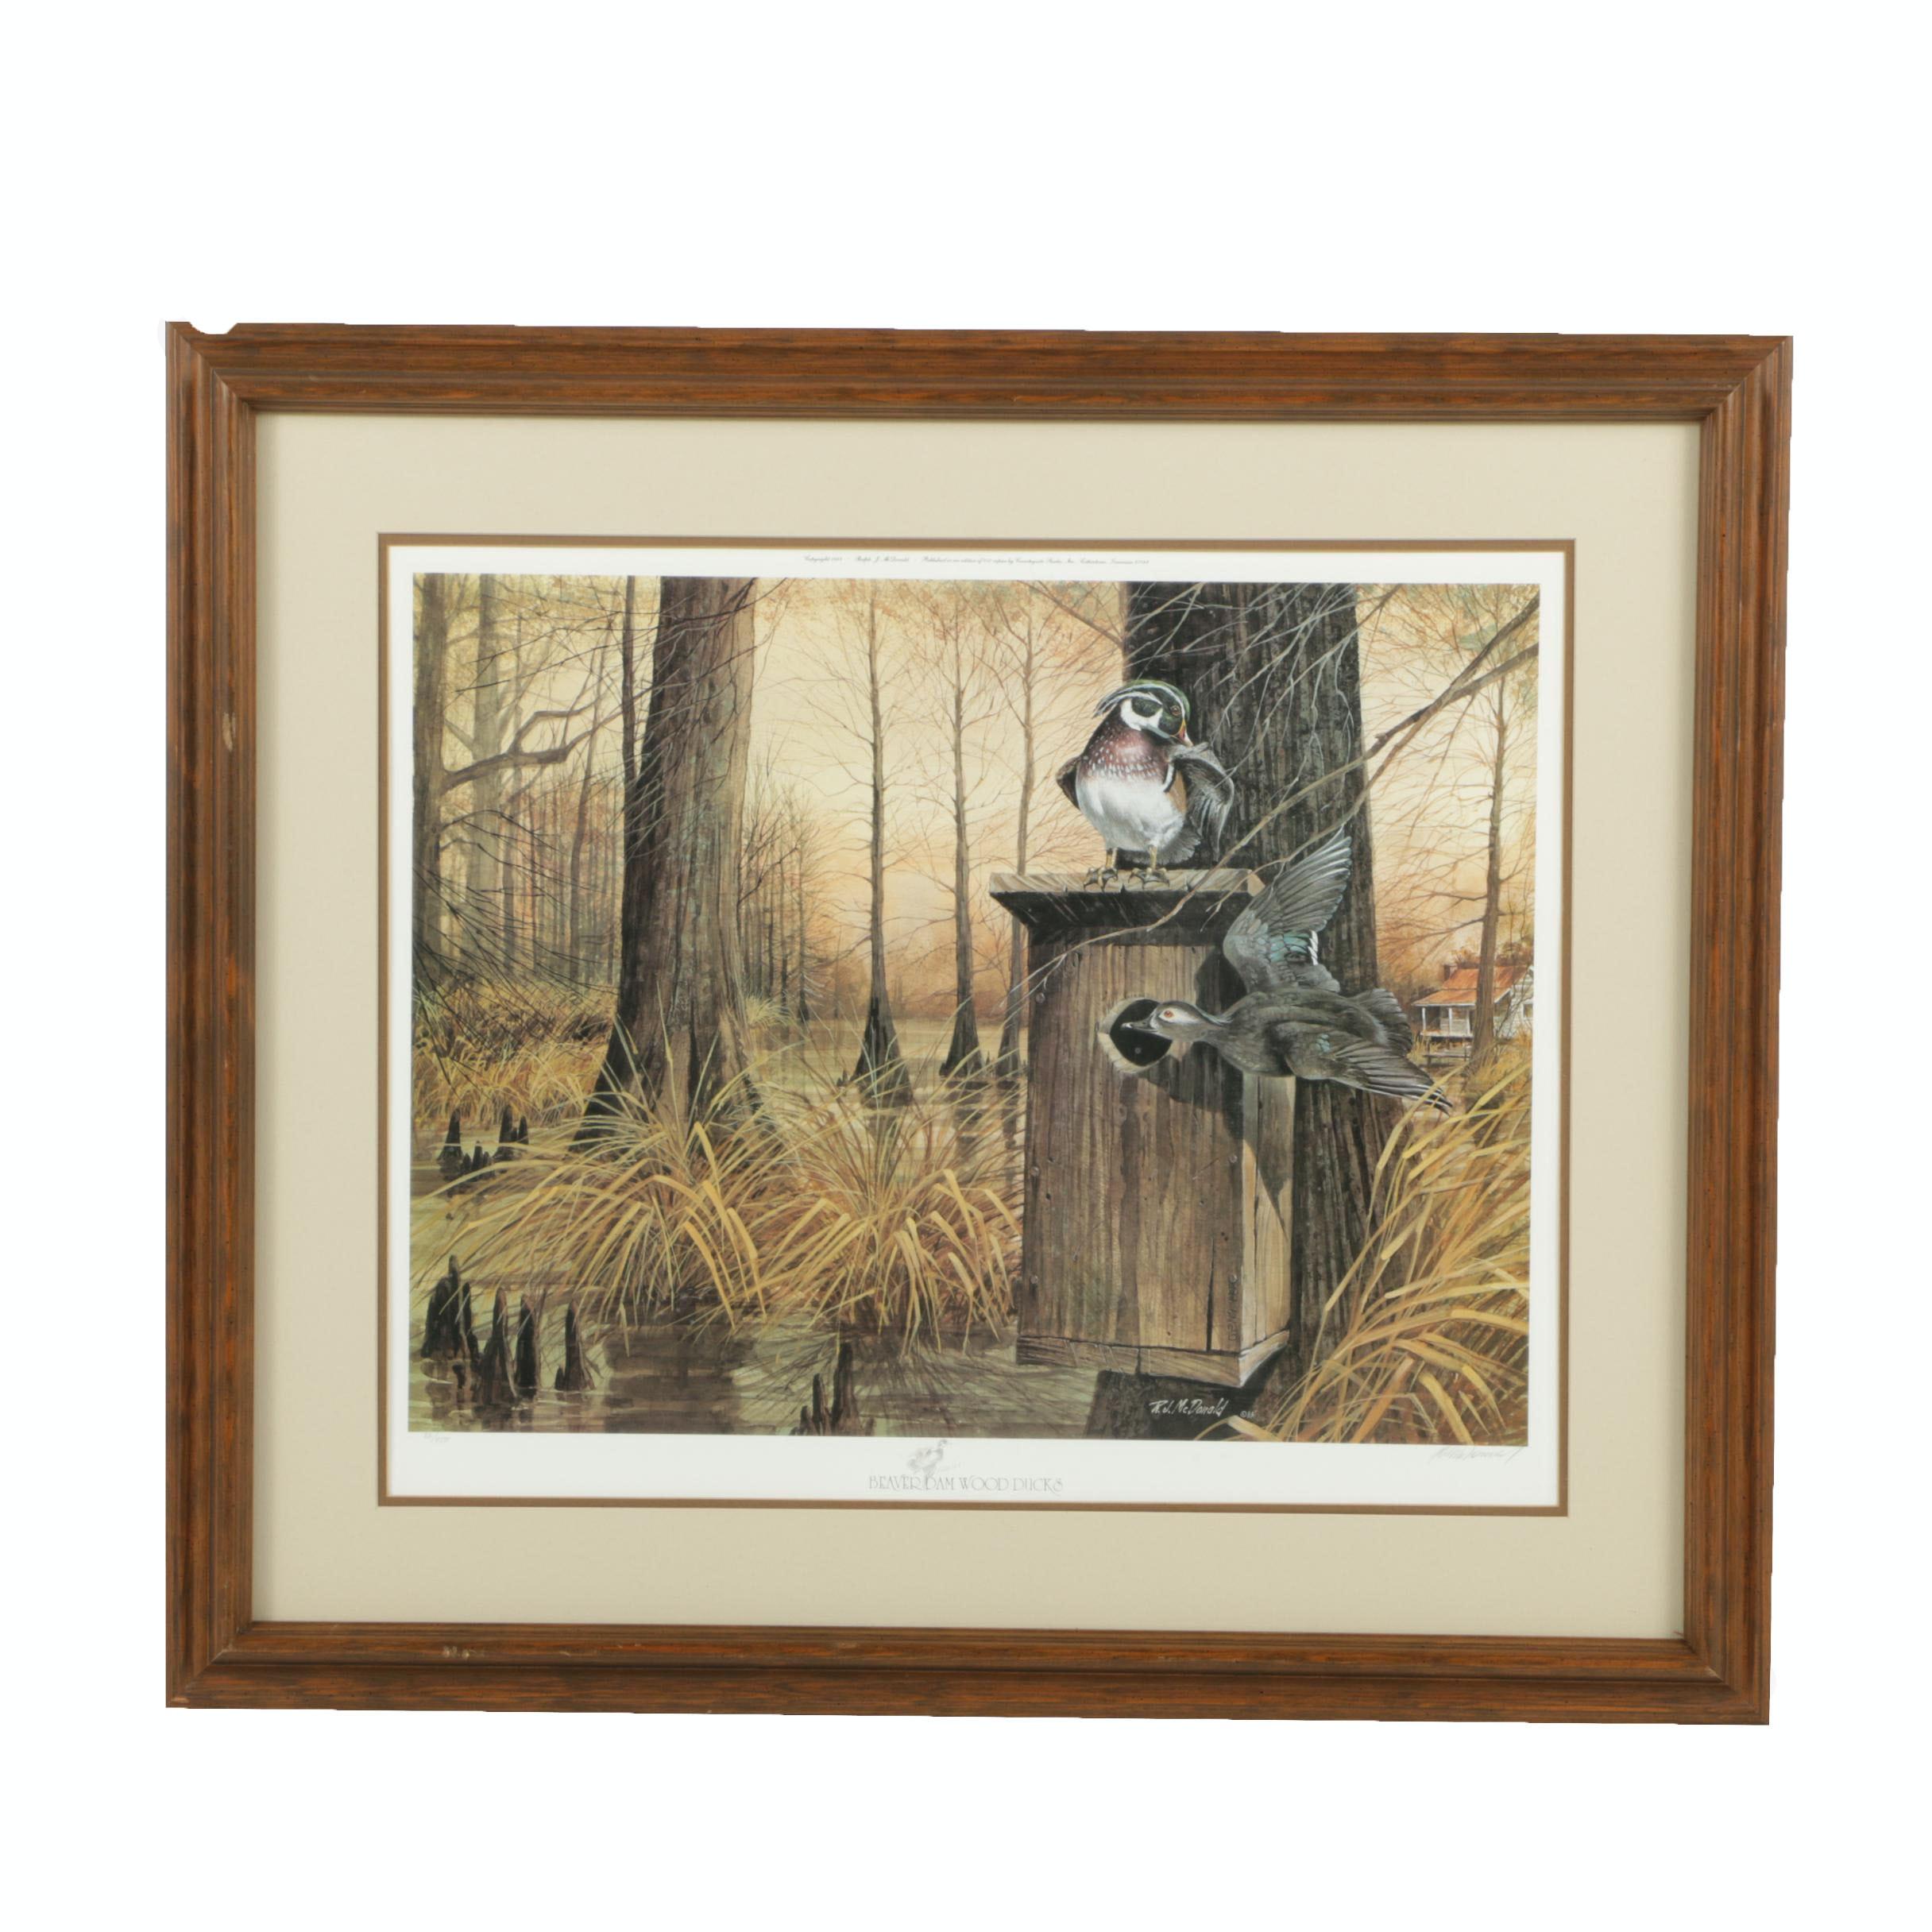 "Ralph McDonald Limited Edition Offset Lithograph ""Beaverdam Wood Ducks"""